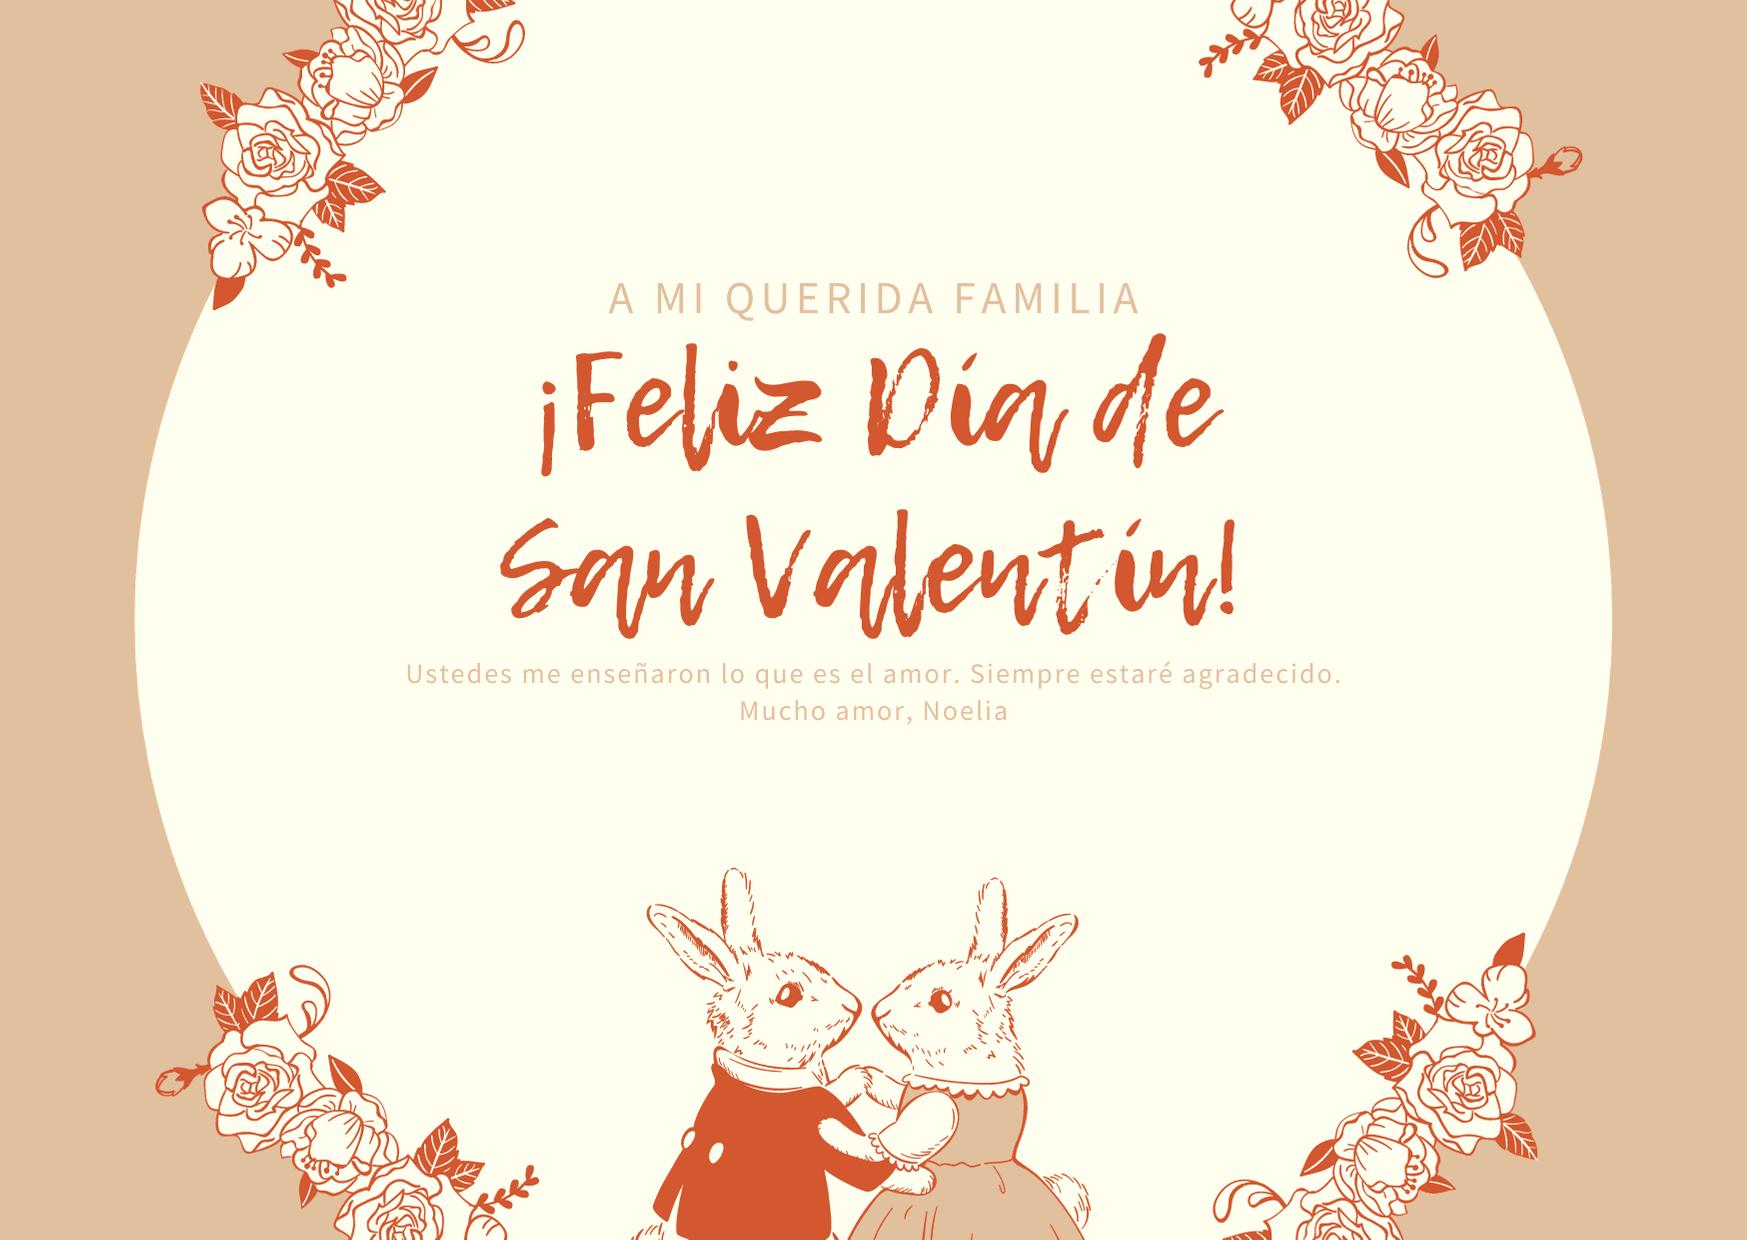 Beige Vintage Estilo Día de San Valentín Tarjeta